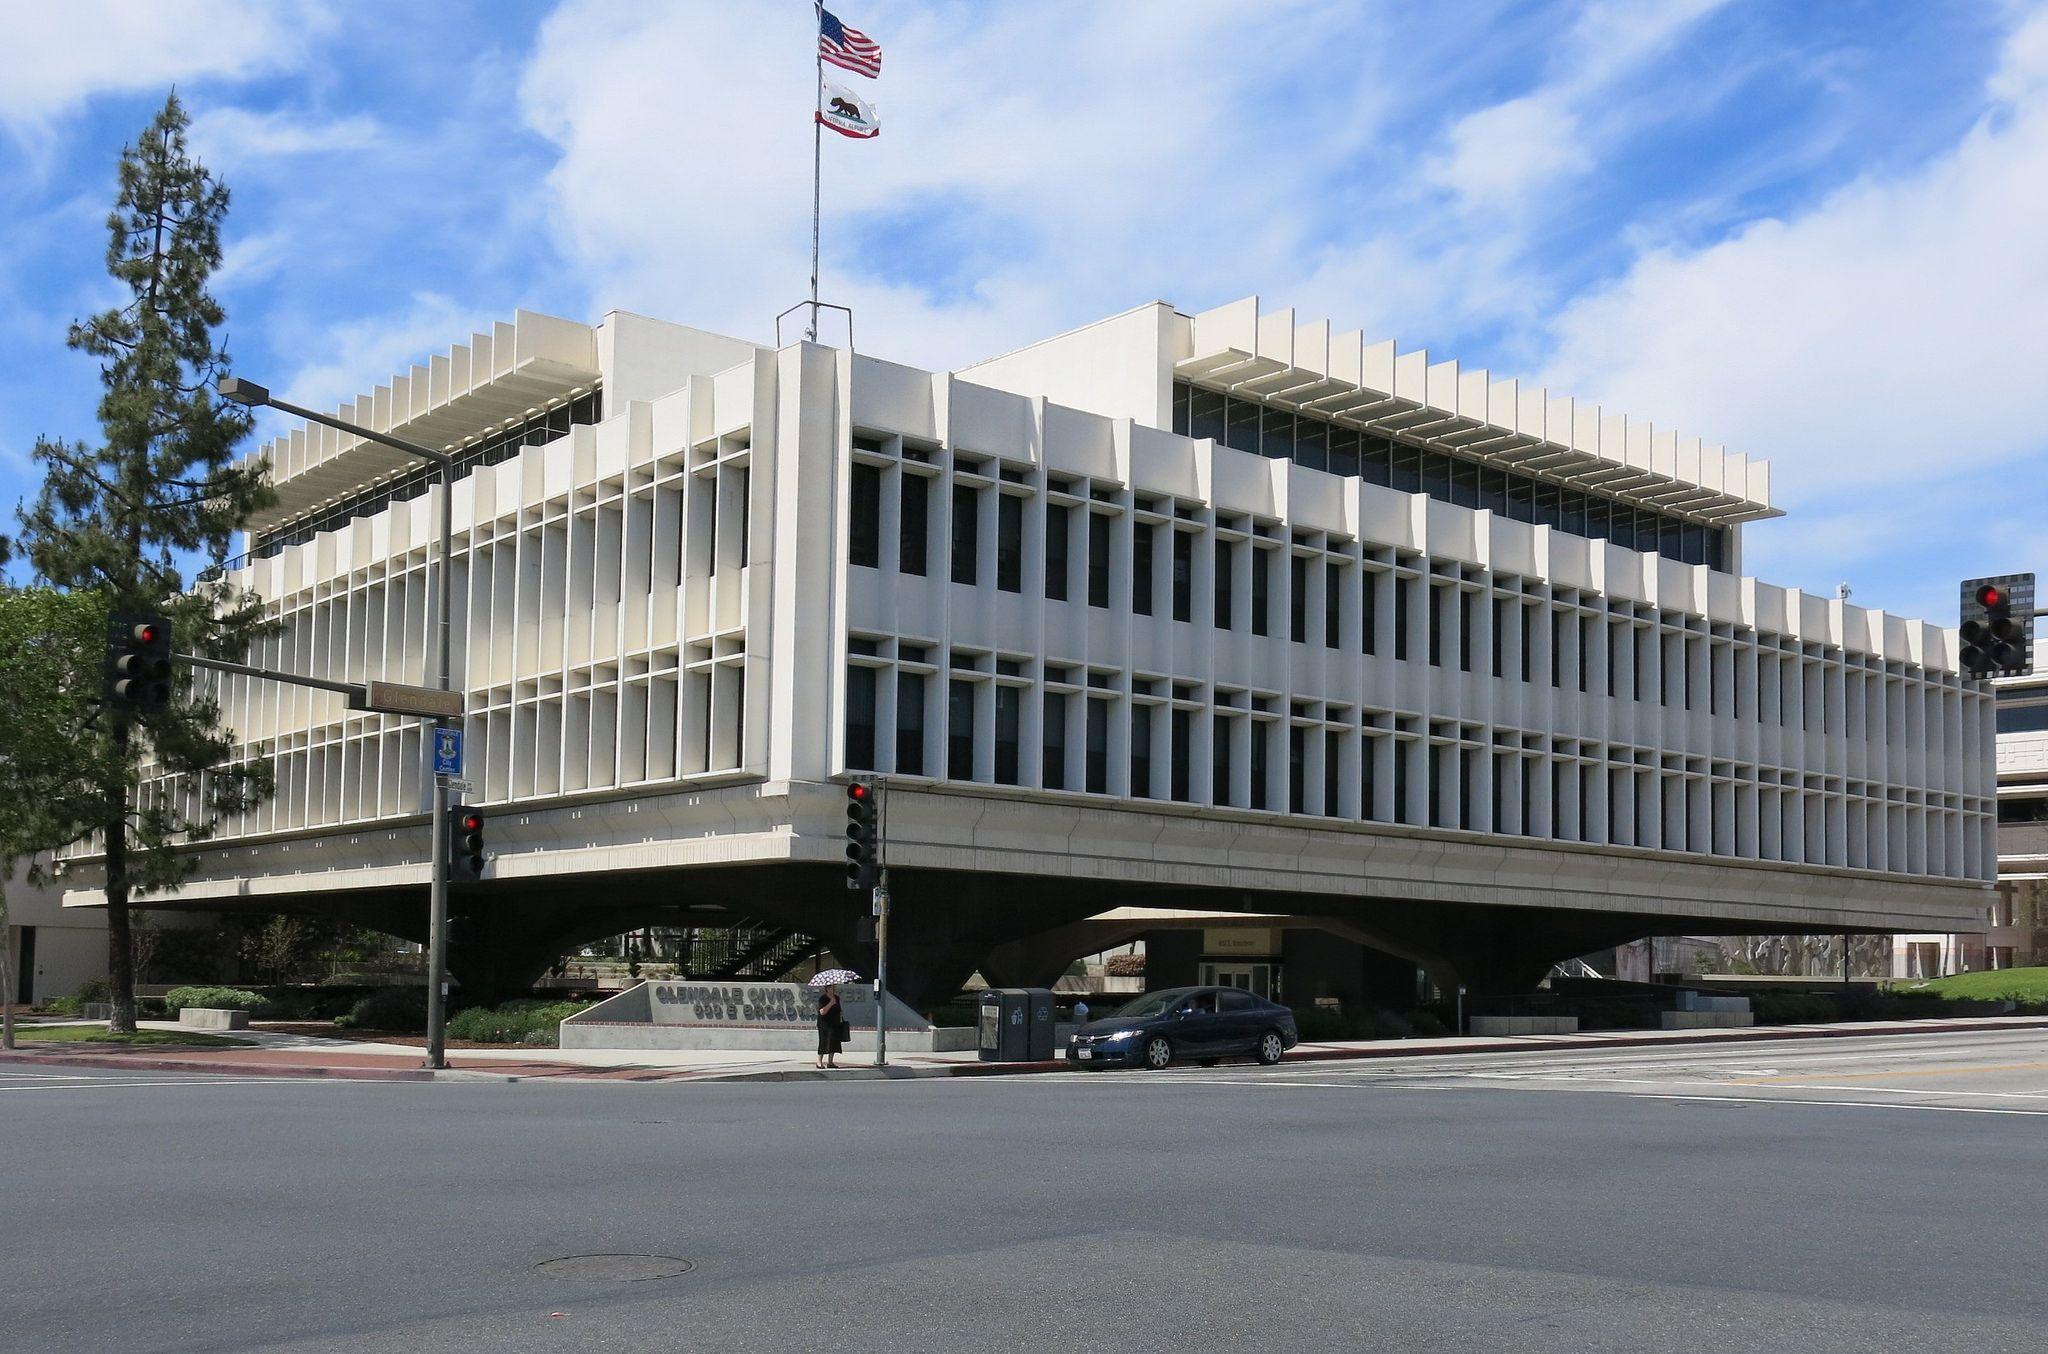 Glendale Municipal Services Building Glendale Ca Glendale Building Architect